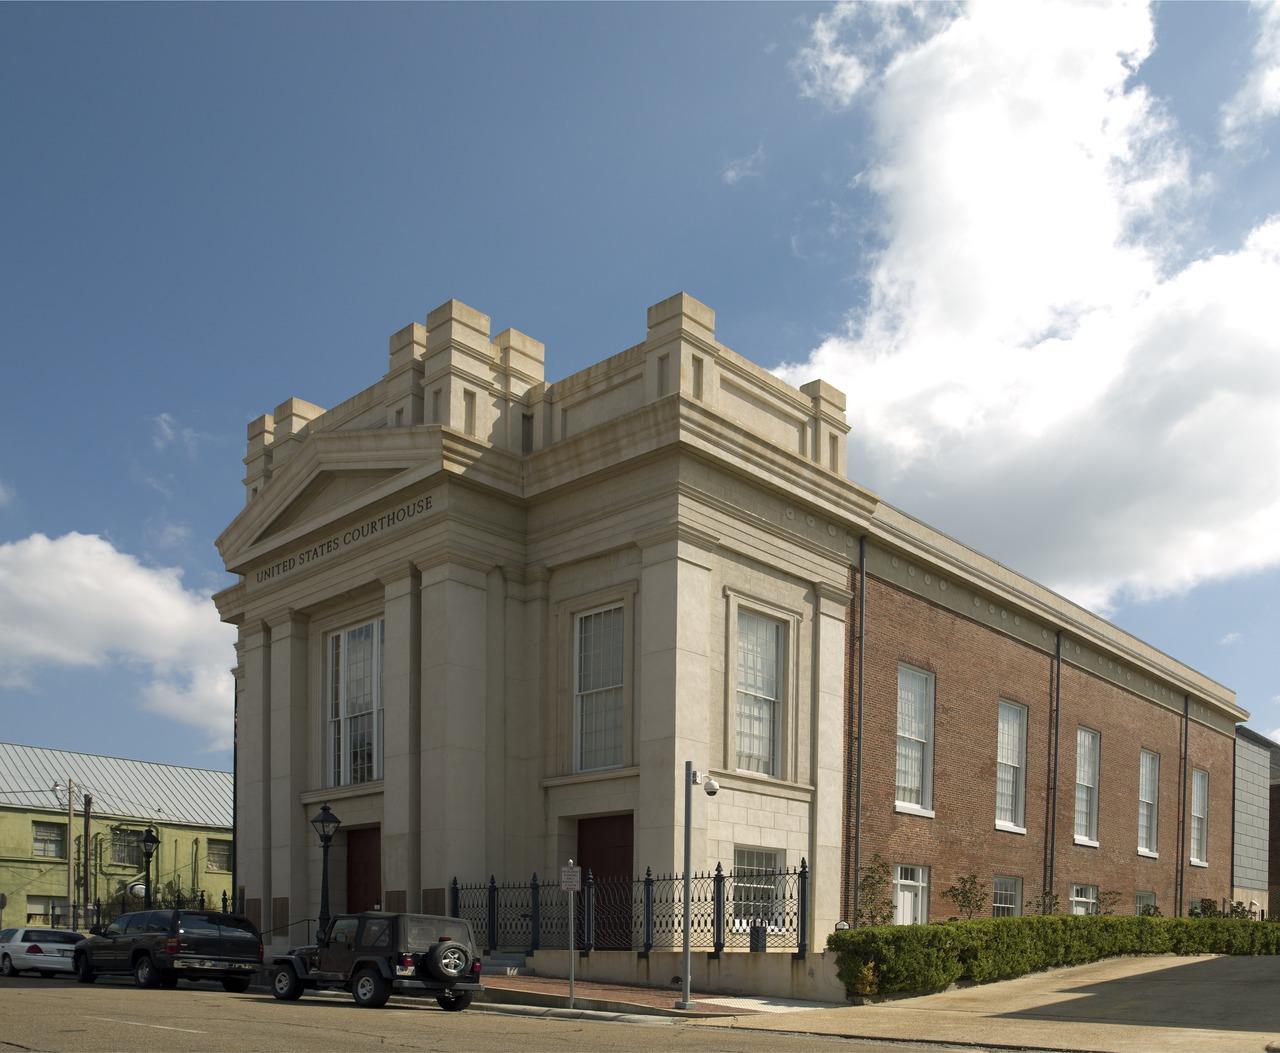 Building, Architecture, Landmark, Property